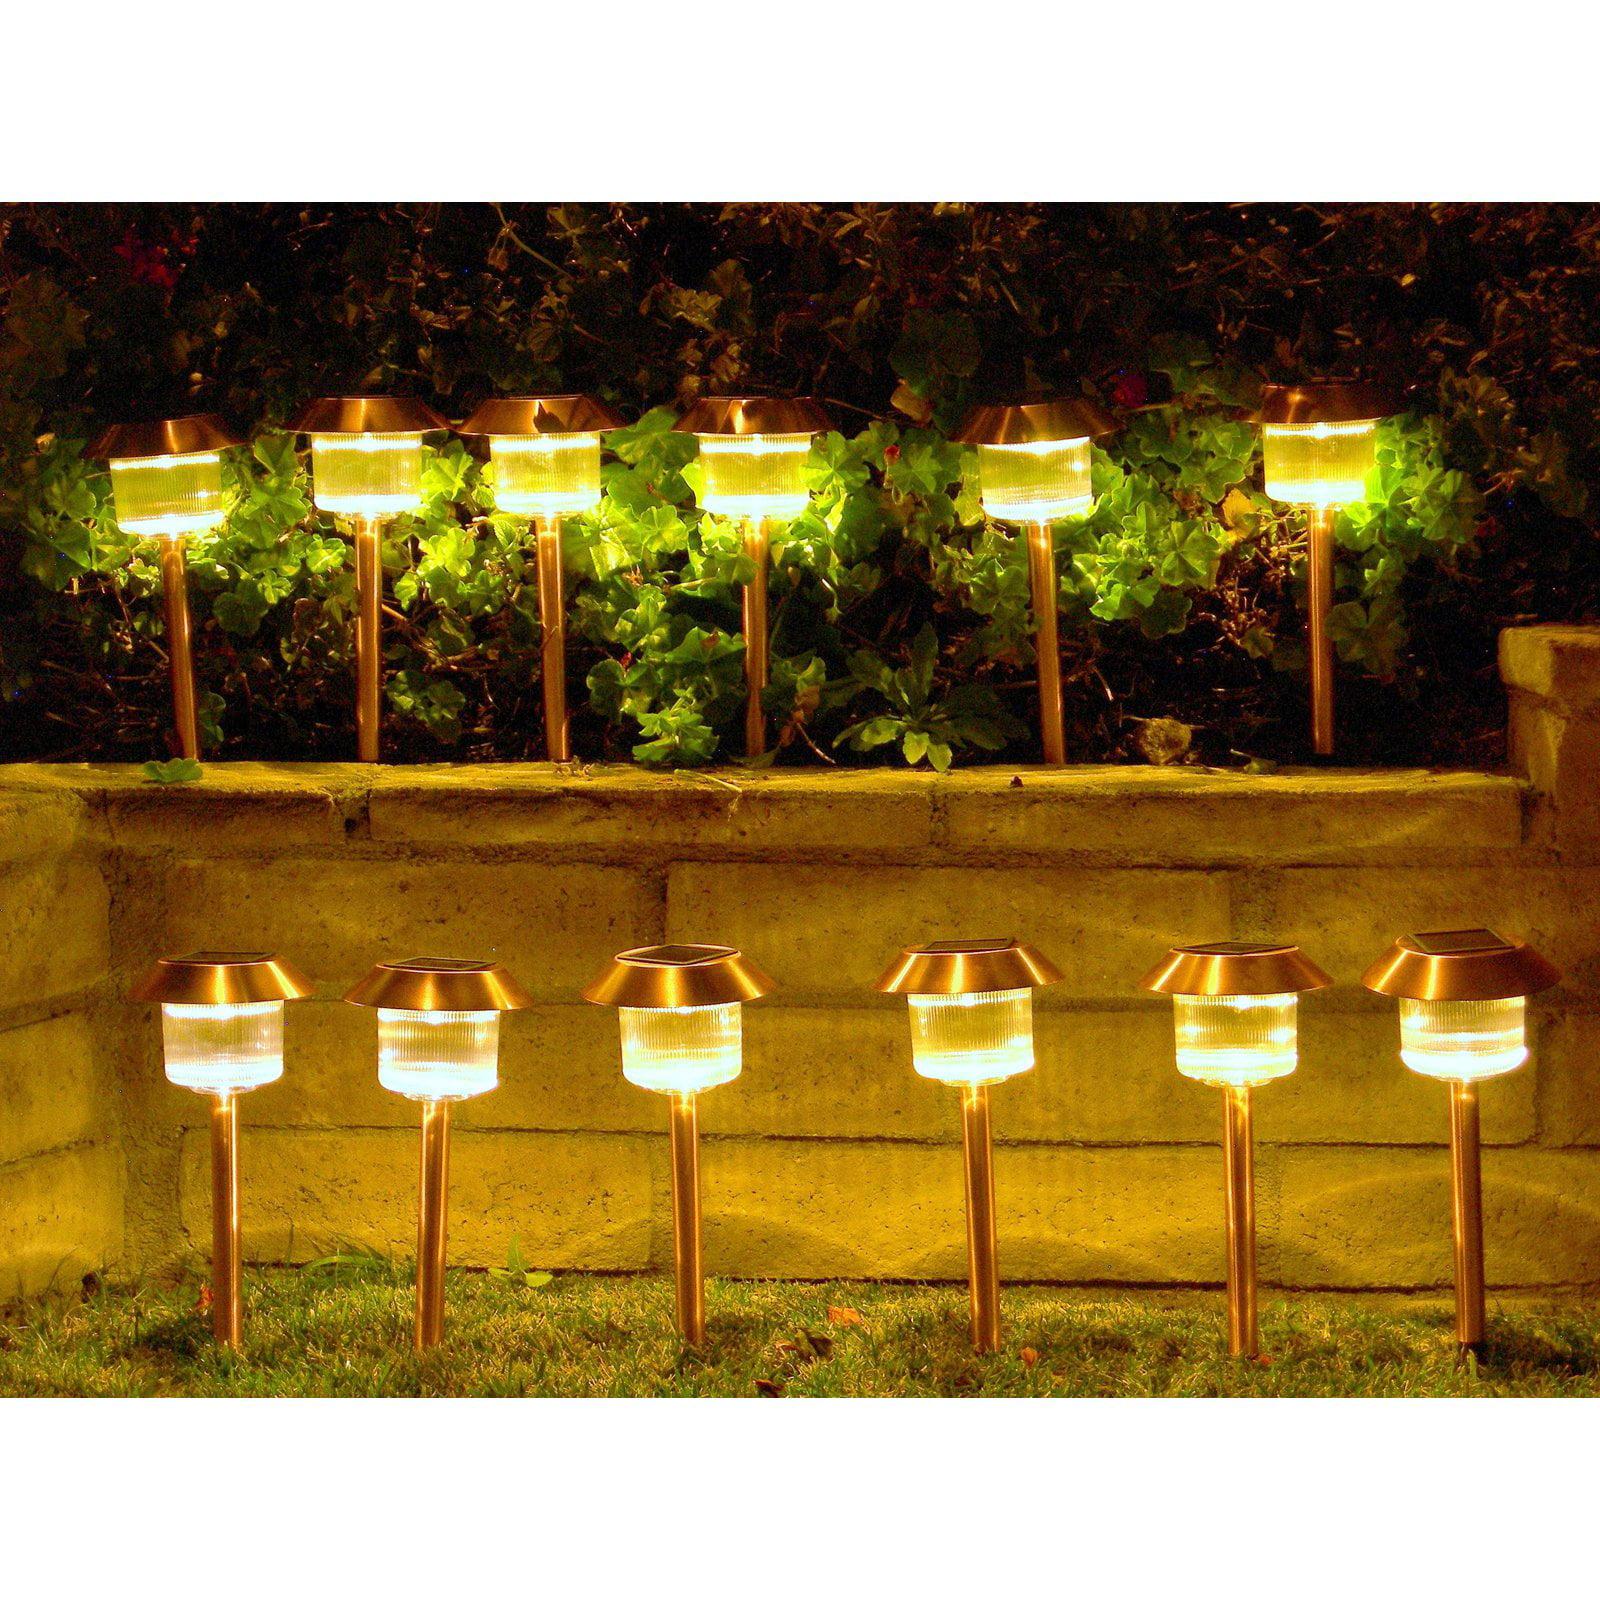 Outdoor Pathway Lighting Sets Homebrite solar power belmont path lights set of 12 walmart workwithnaturefo